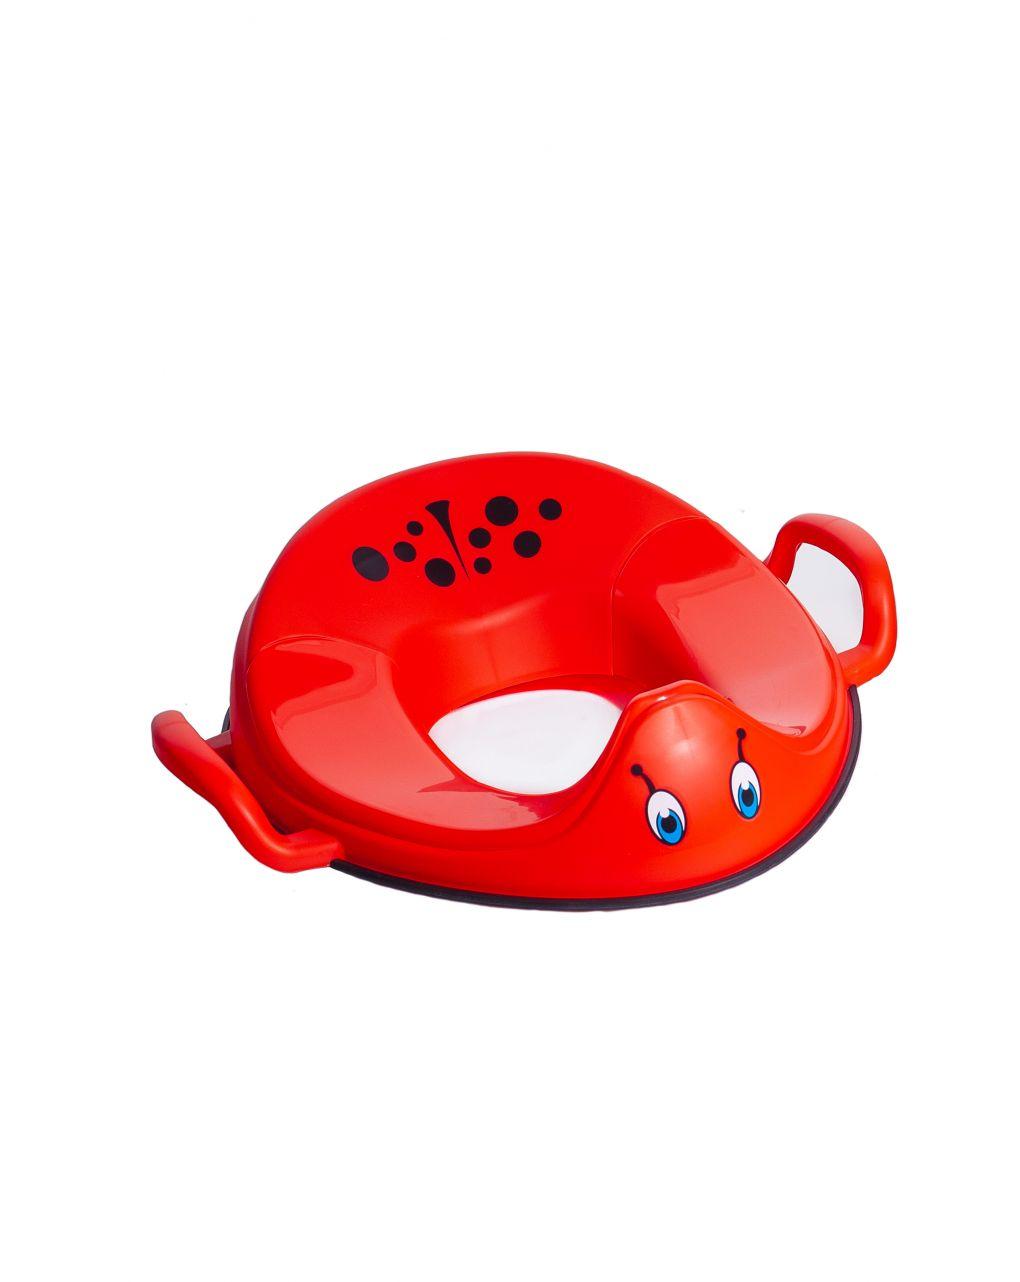 Mcp riduttore ladybug - Giordani